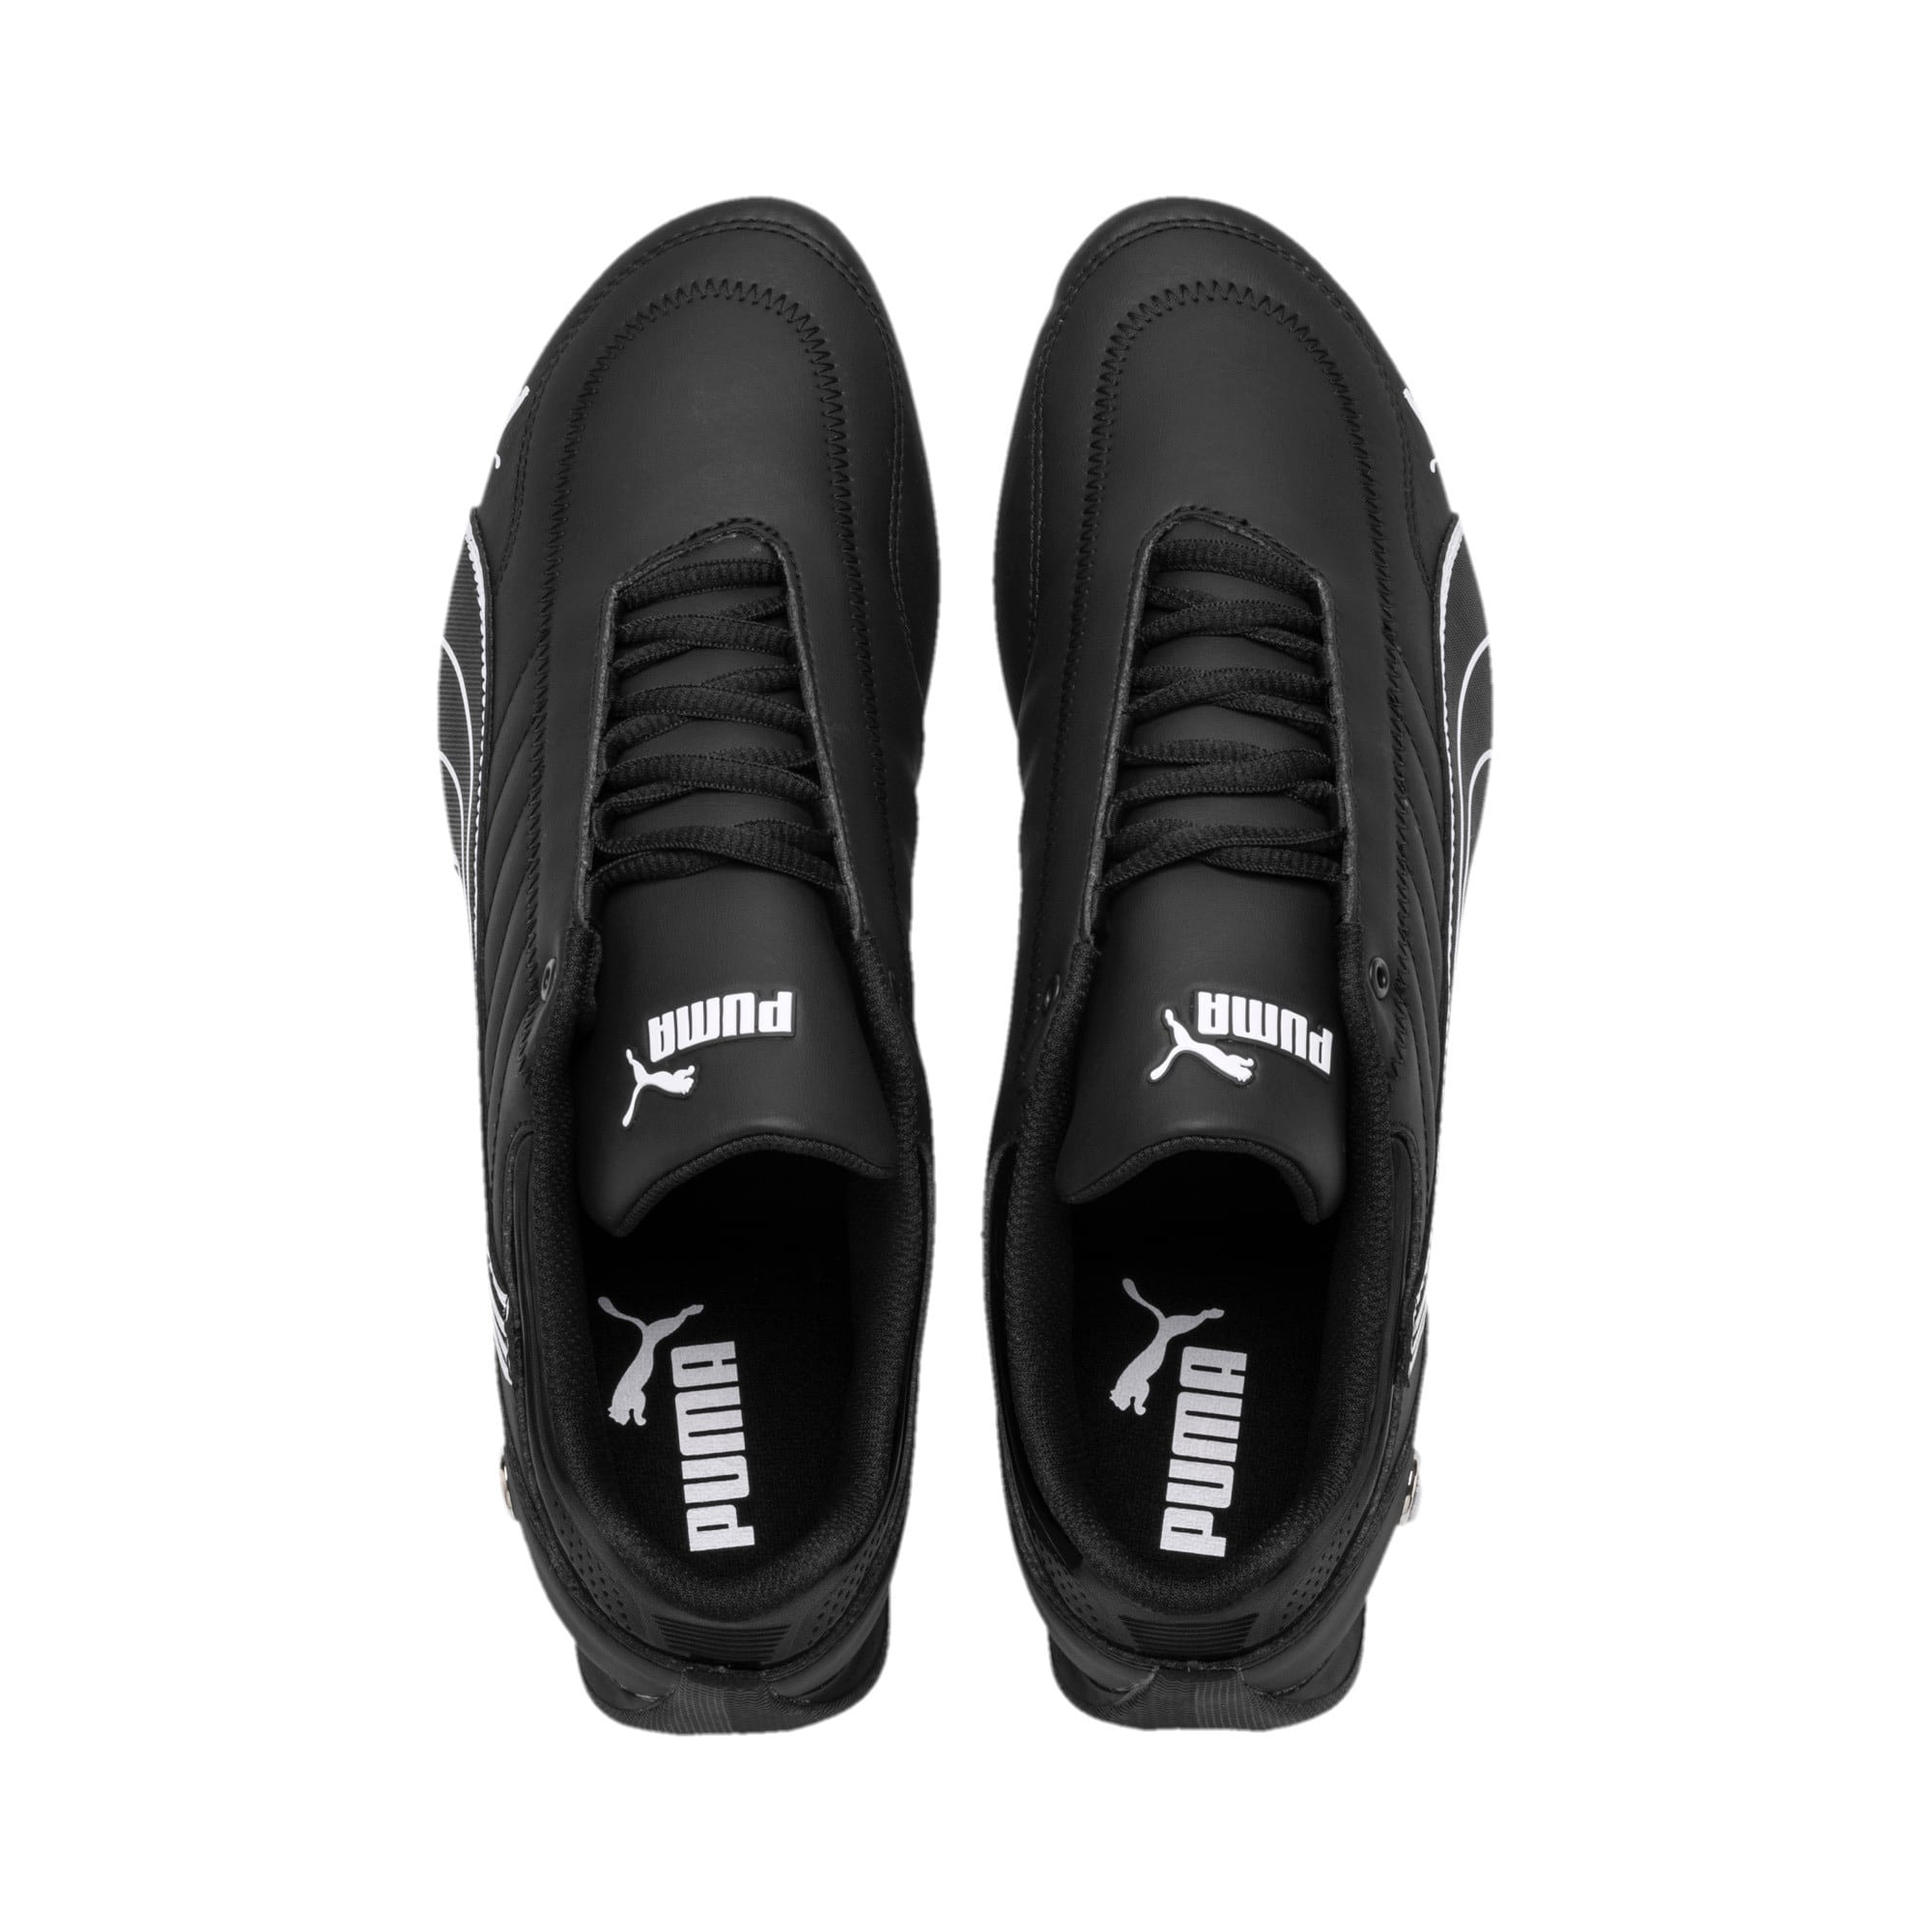 Thumbnail 7 of BMW M Motorsport Future Kart Cat Shoes, Puma Black-Puma White, medium